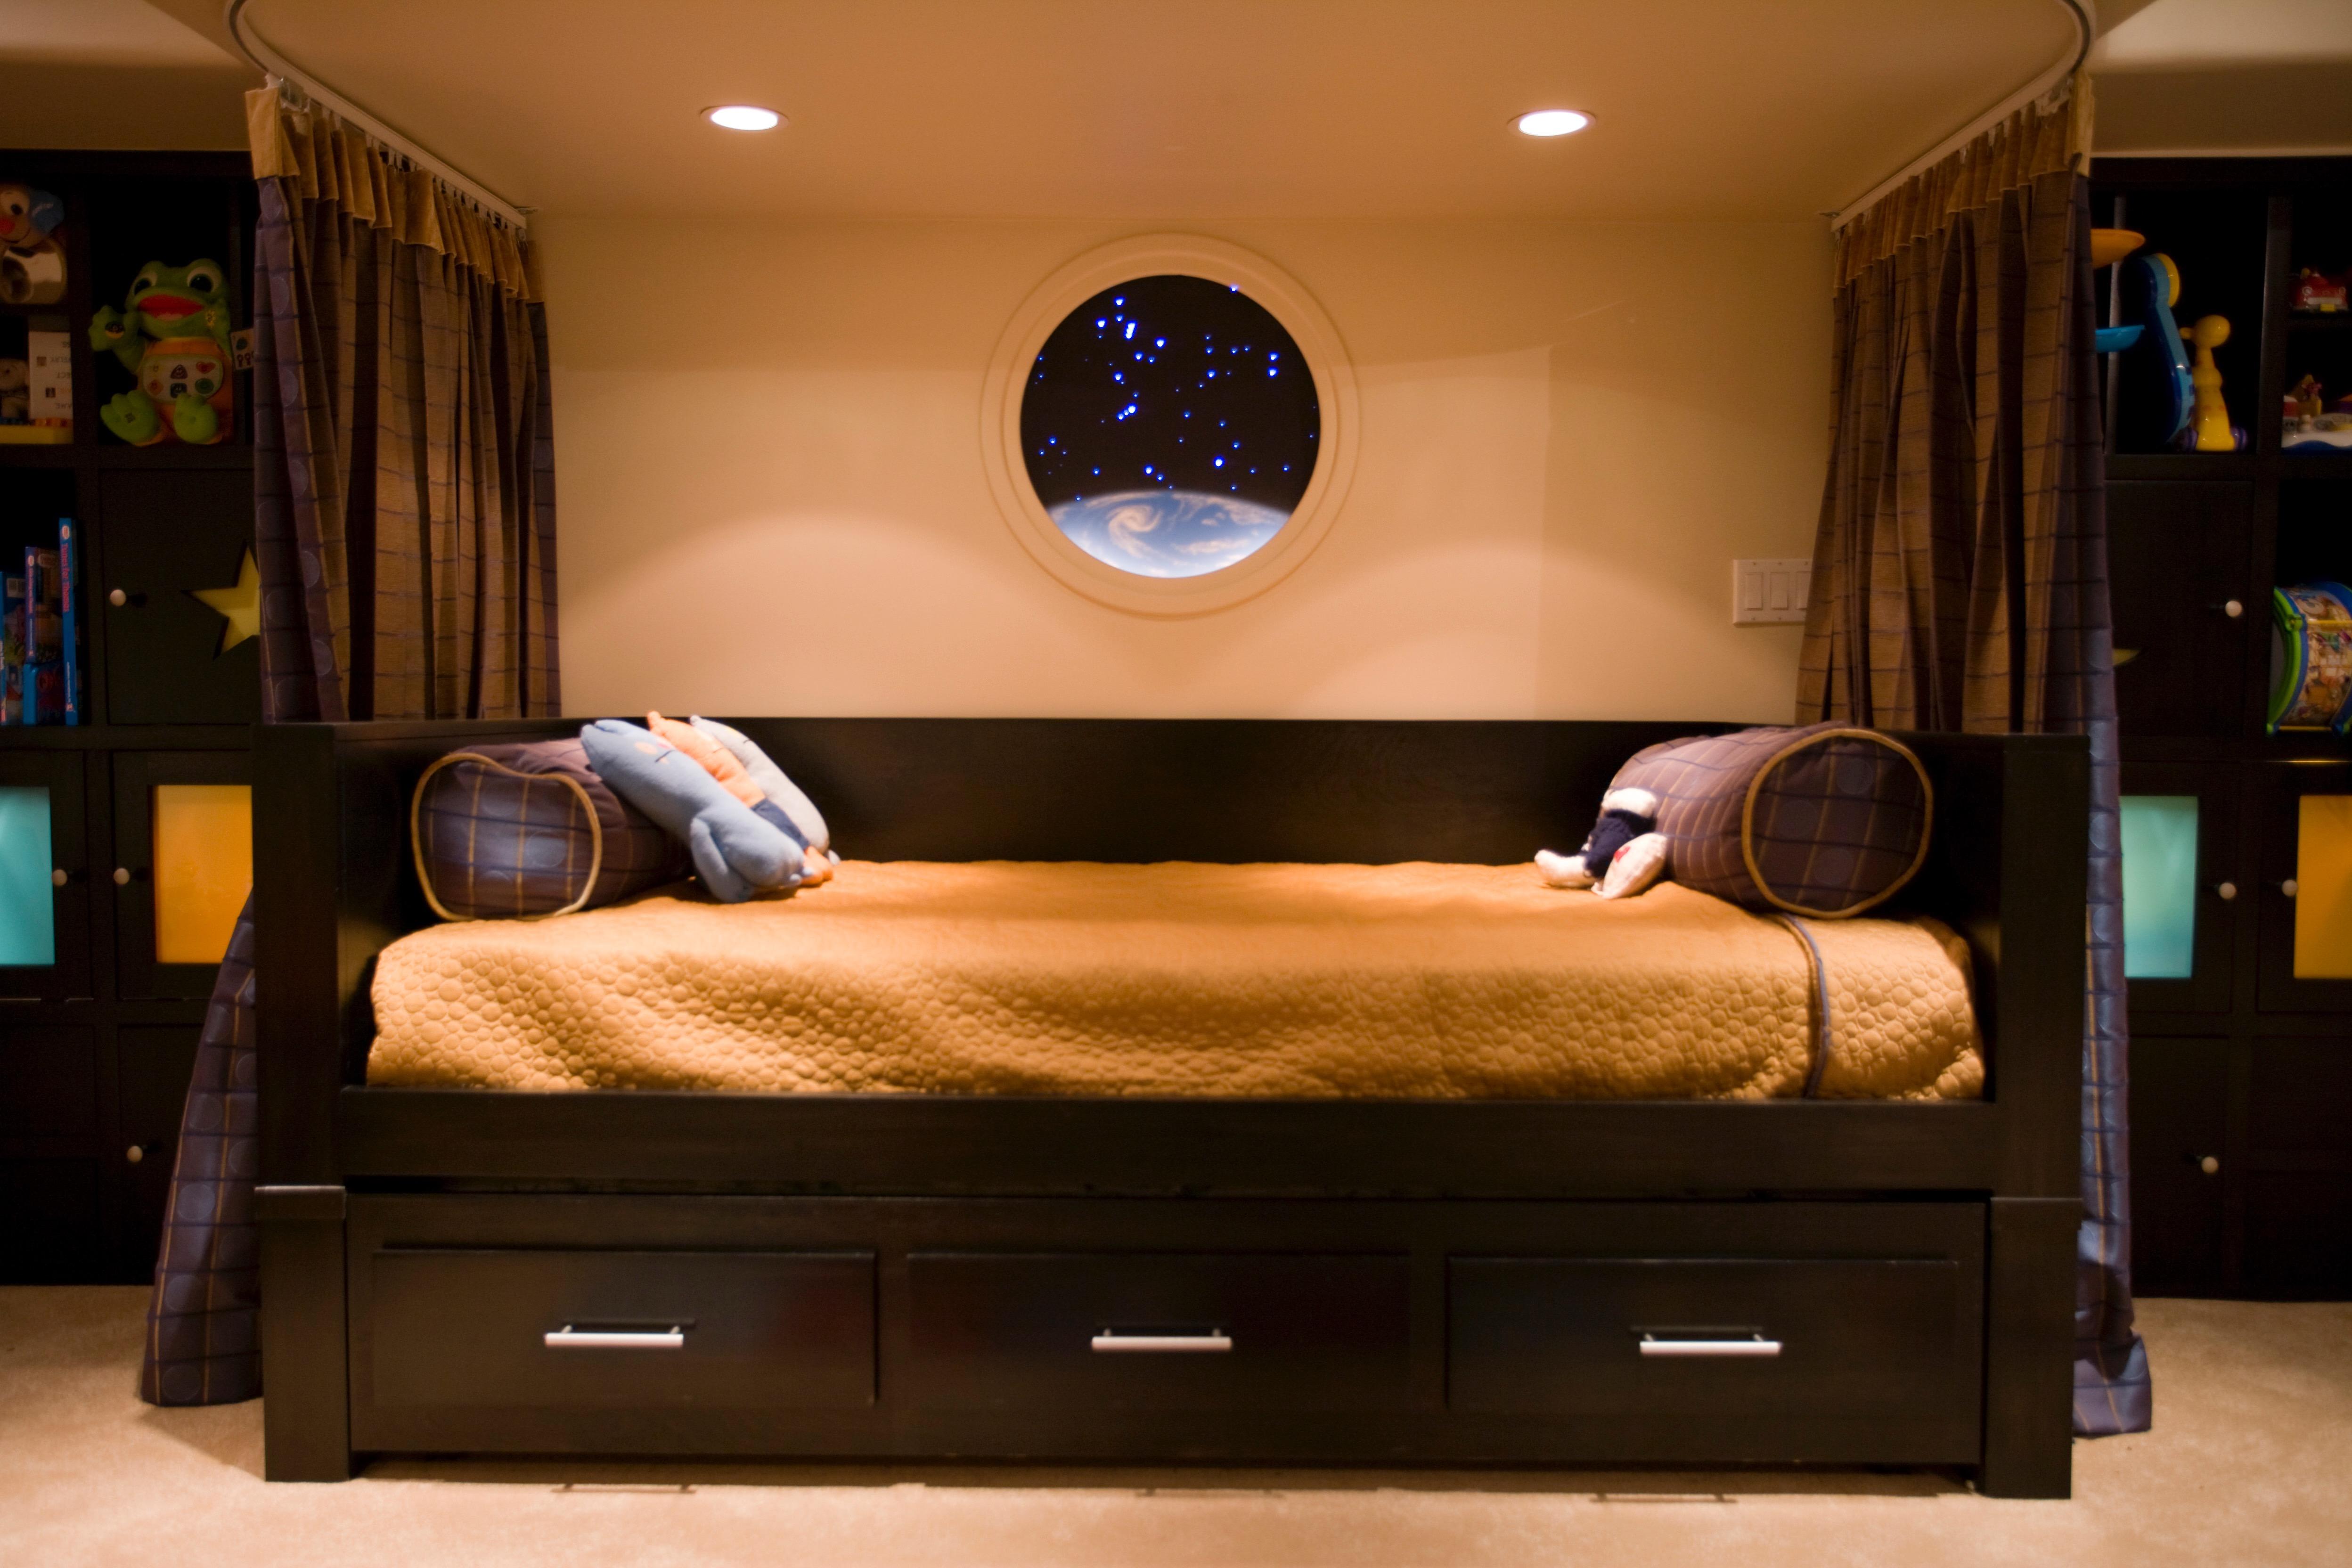 Custom Made Beds Image Gallery: UFM Custom Gallery Images